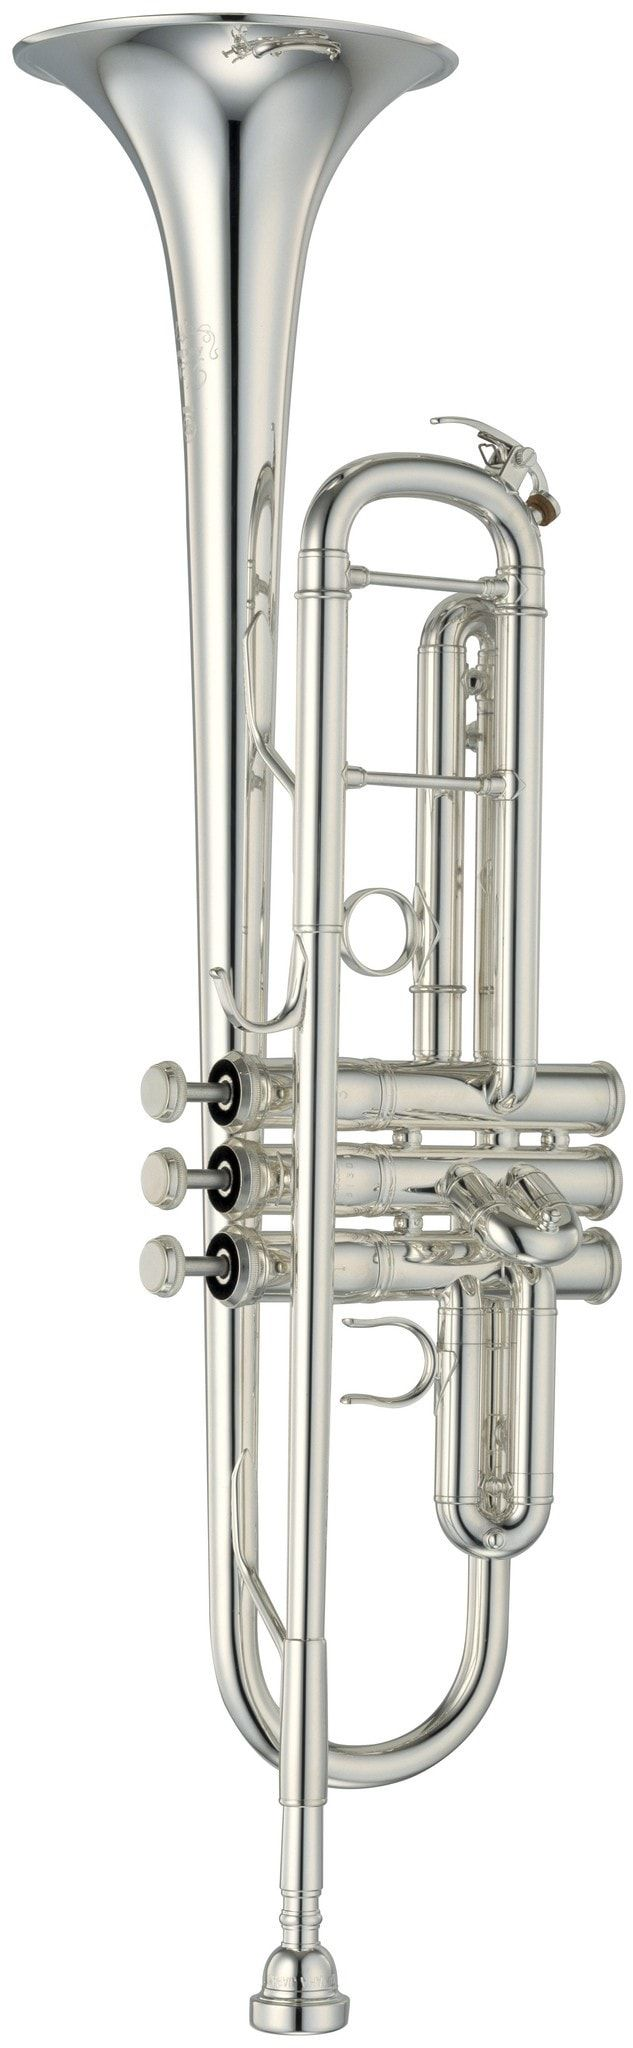 Yamaha YTR-9335NYSII Xeno Series Bb Trumpet | Robert Sullivan Design